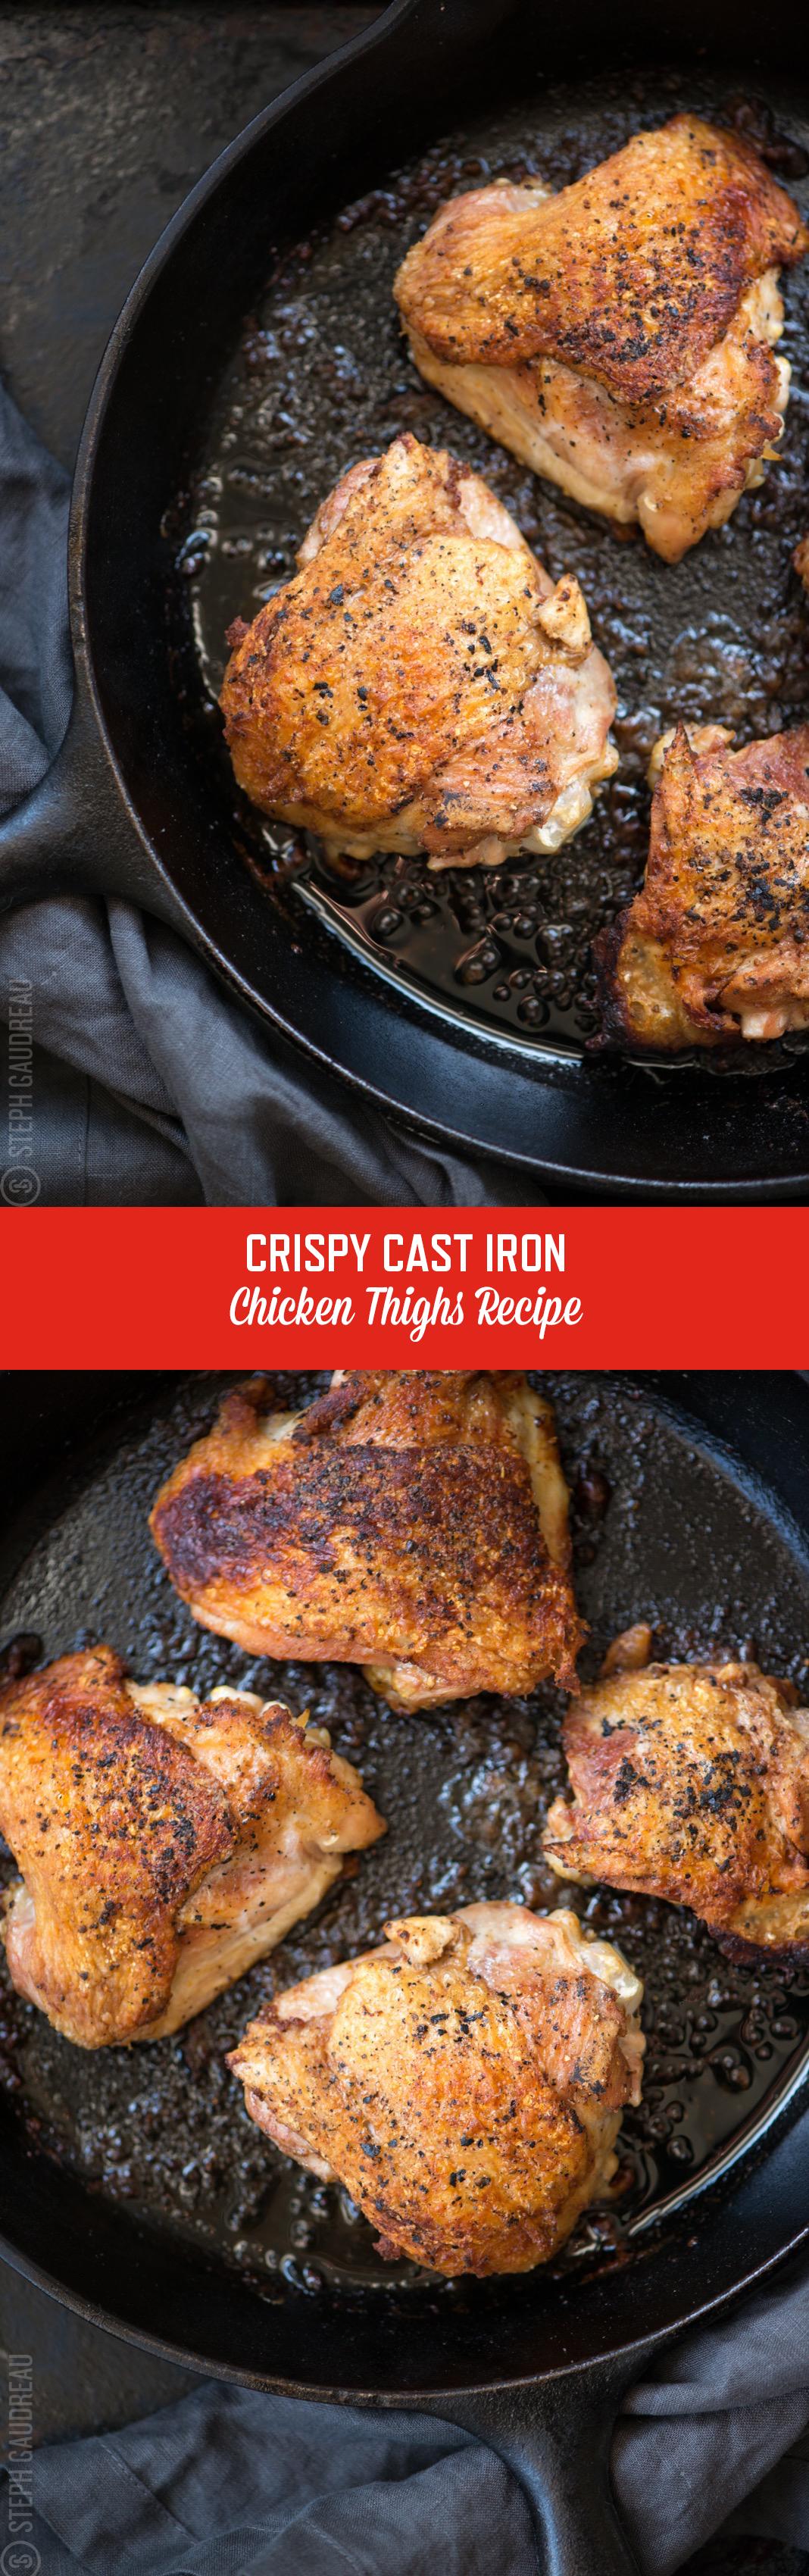 Cast Iron Skillet Chicken Thighs Cast iron skillet